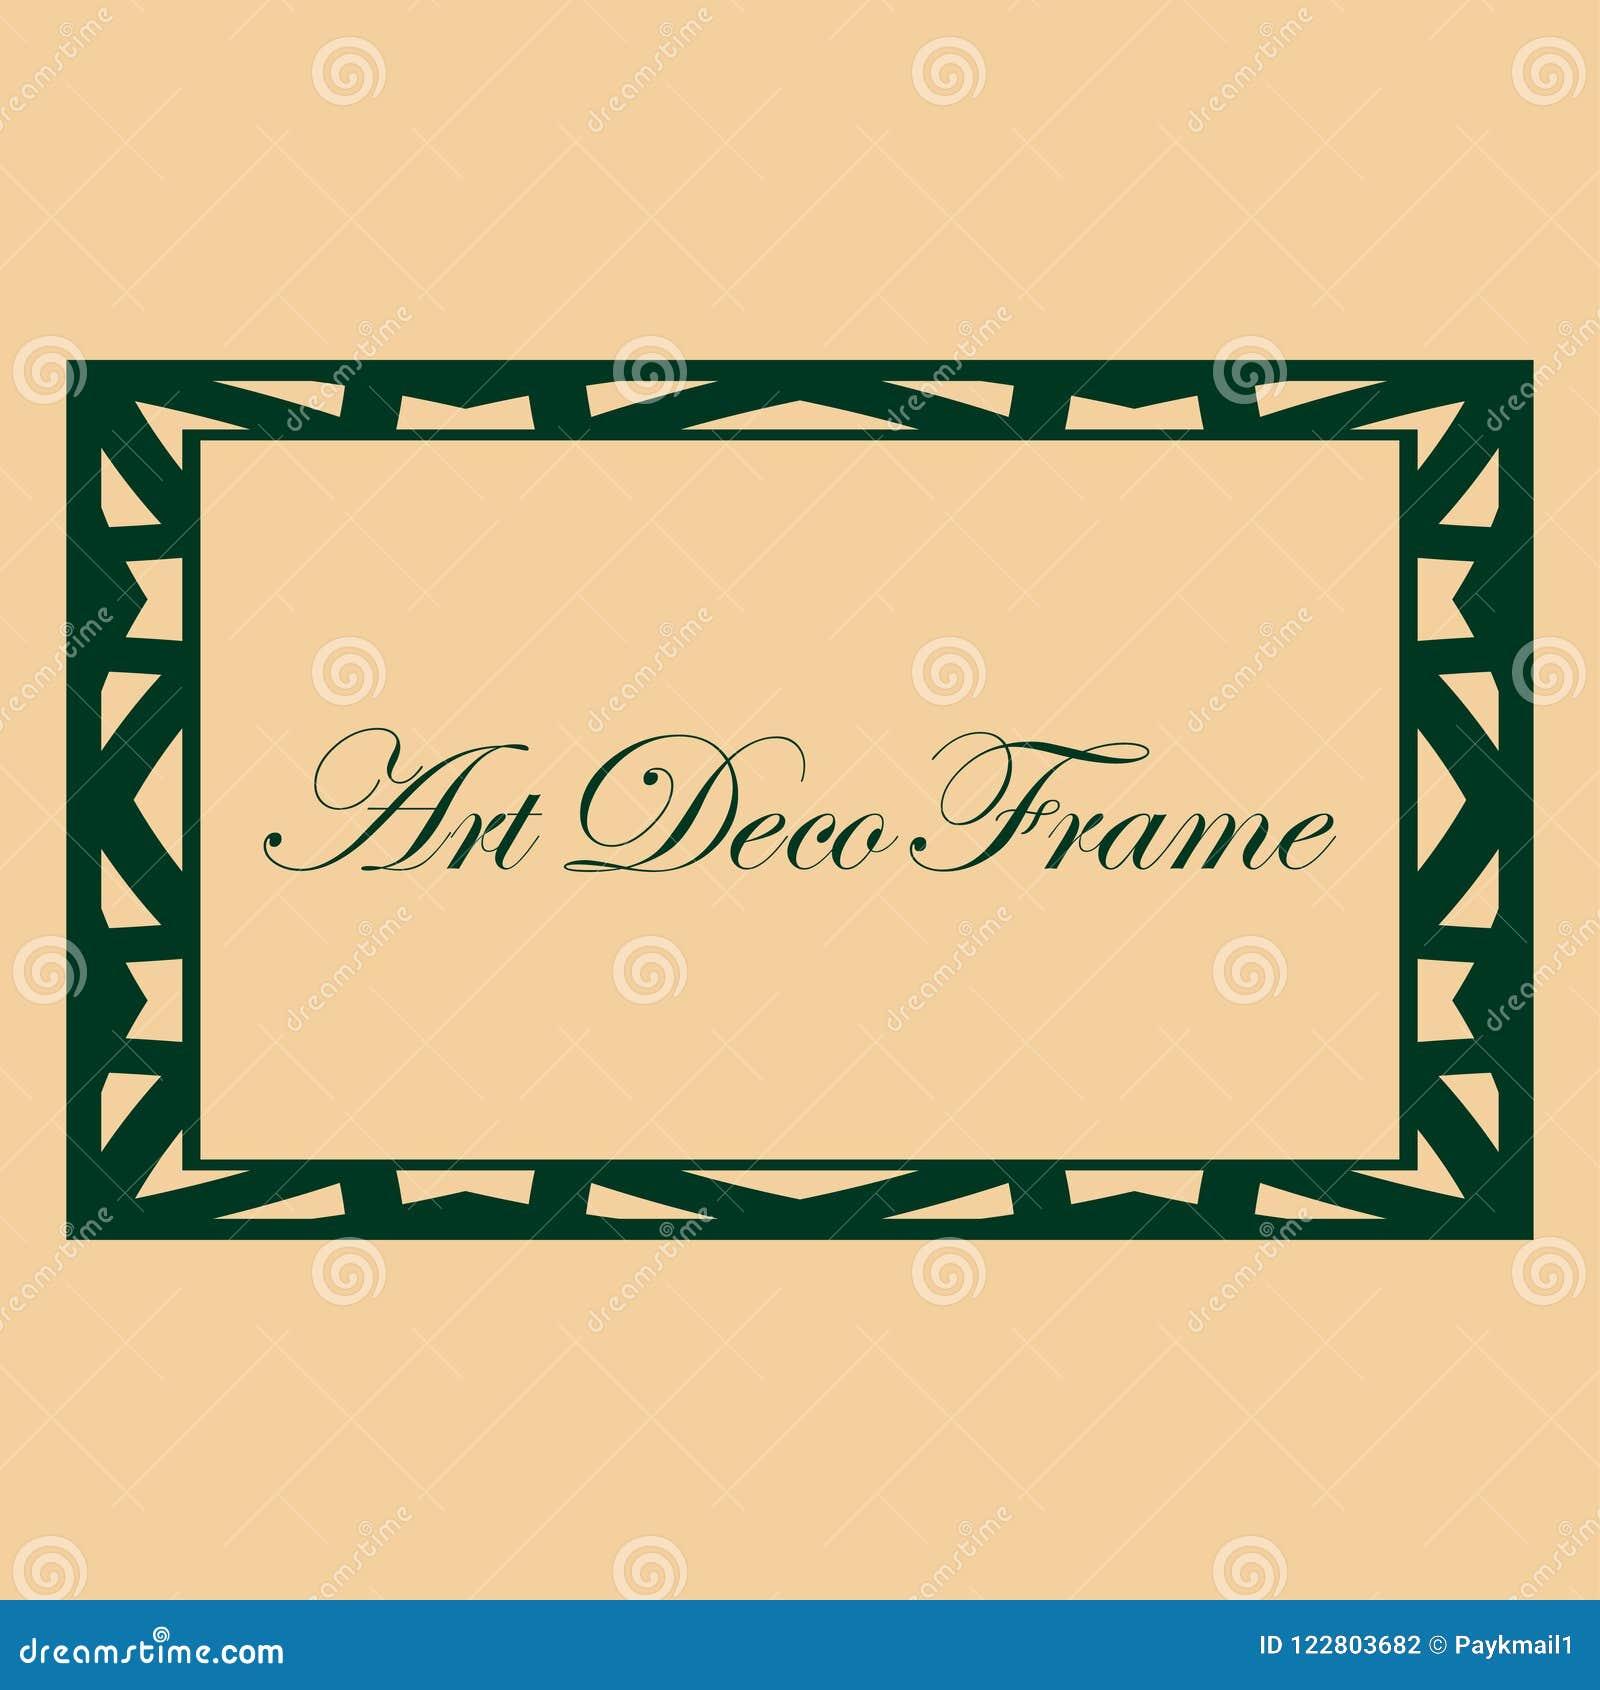 Bookplate Template   Art Deco Frame Stock Vector Illustration Of Bookplate 122803682